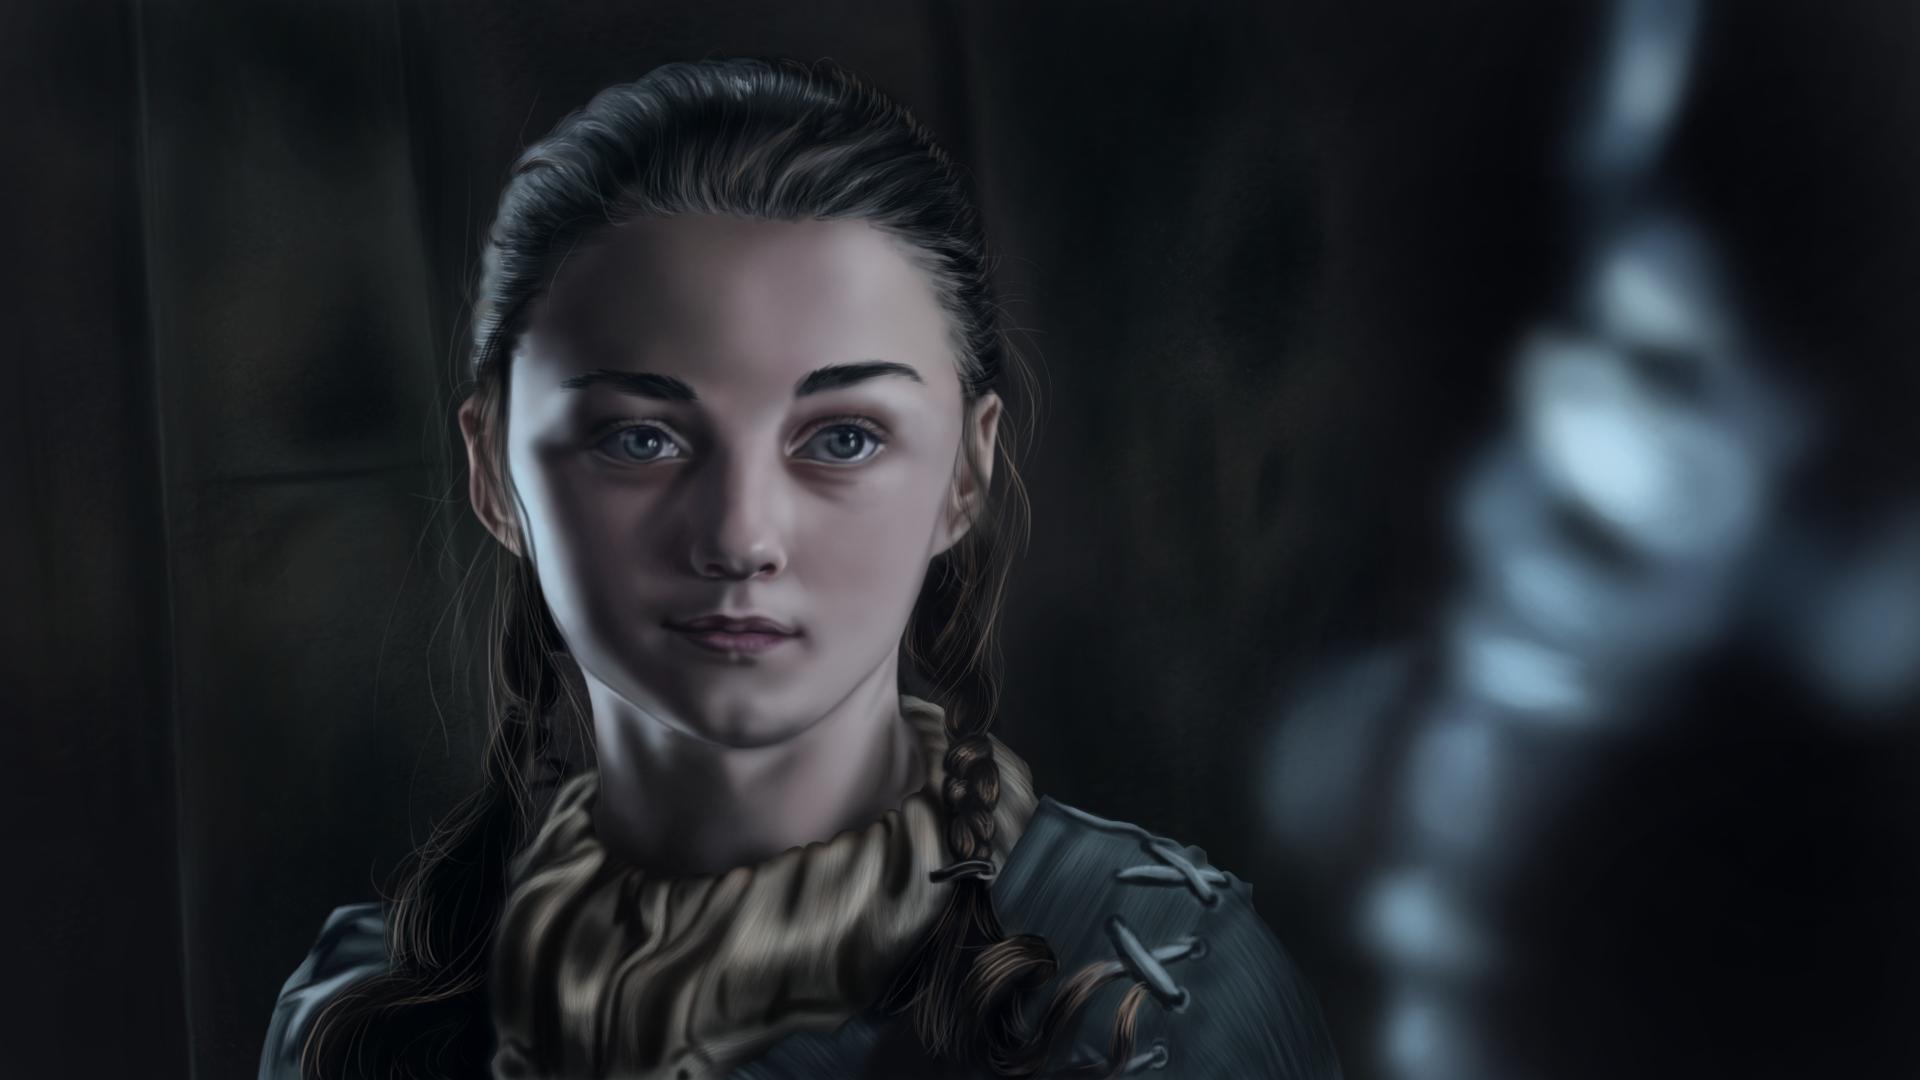 Arya stark by diana scribbles on deviantart